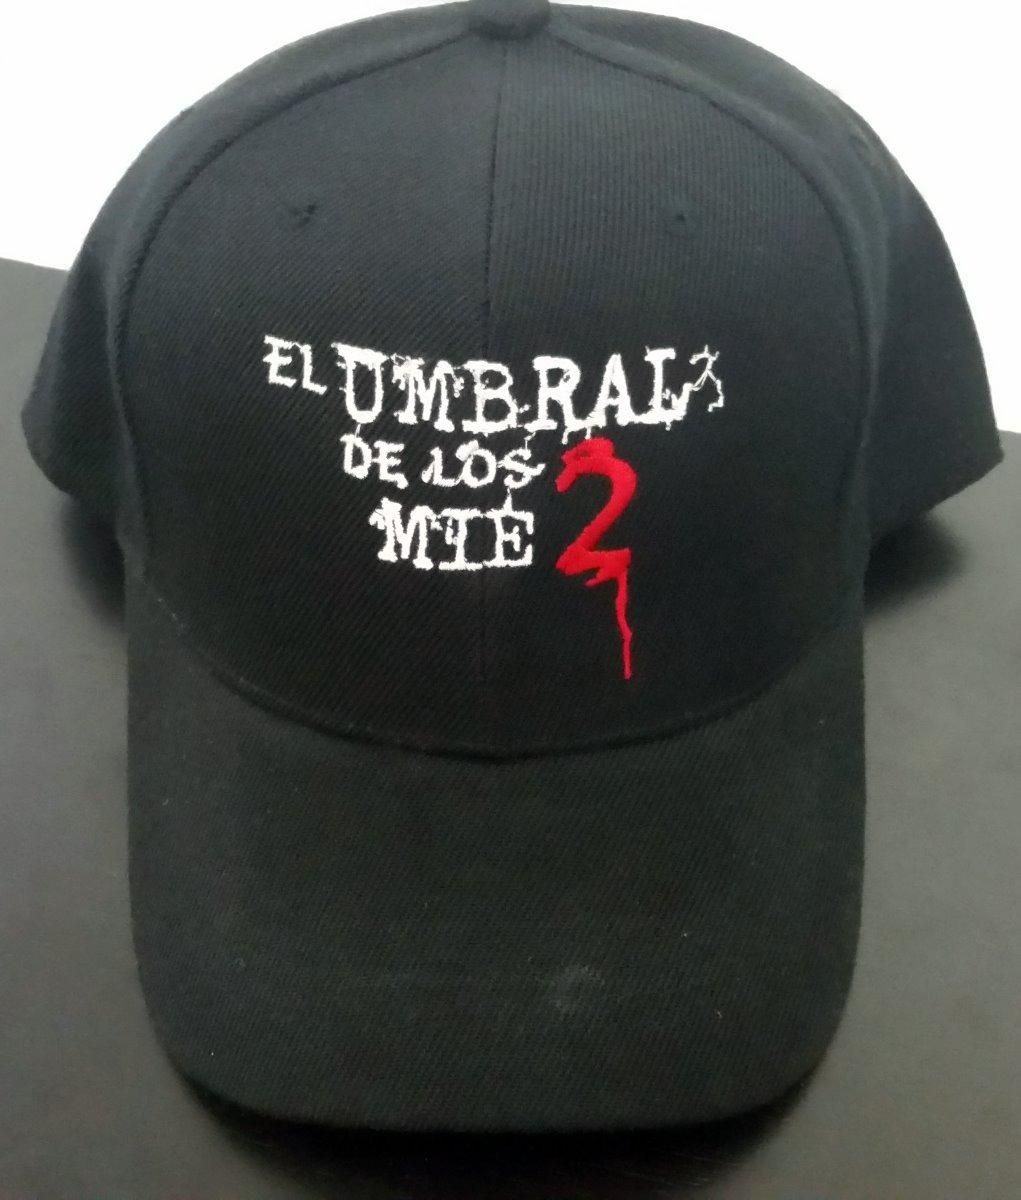 Gorra Acrilicas Bordados Personalizadas -   45.00 en Mercado Libre c9c4385aee9